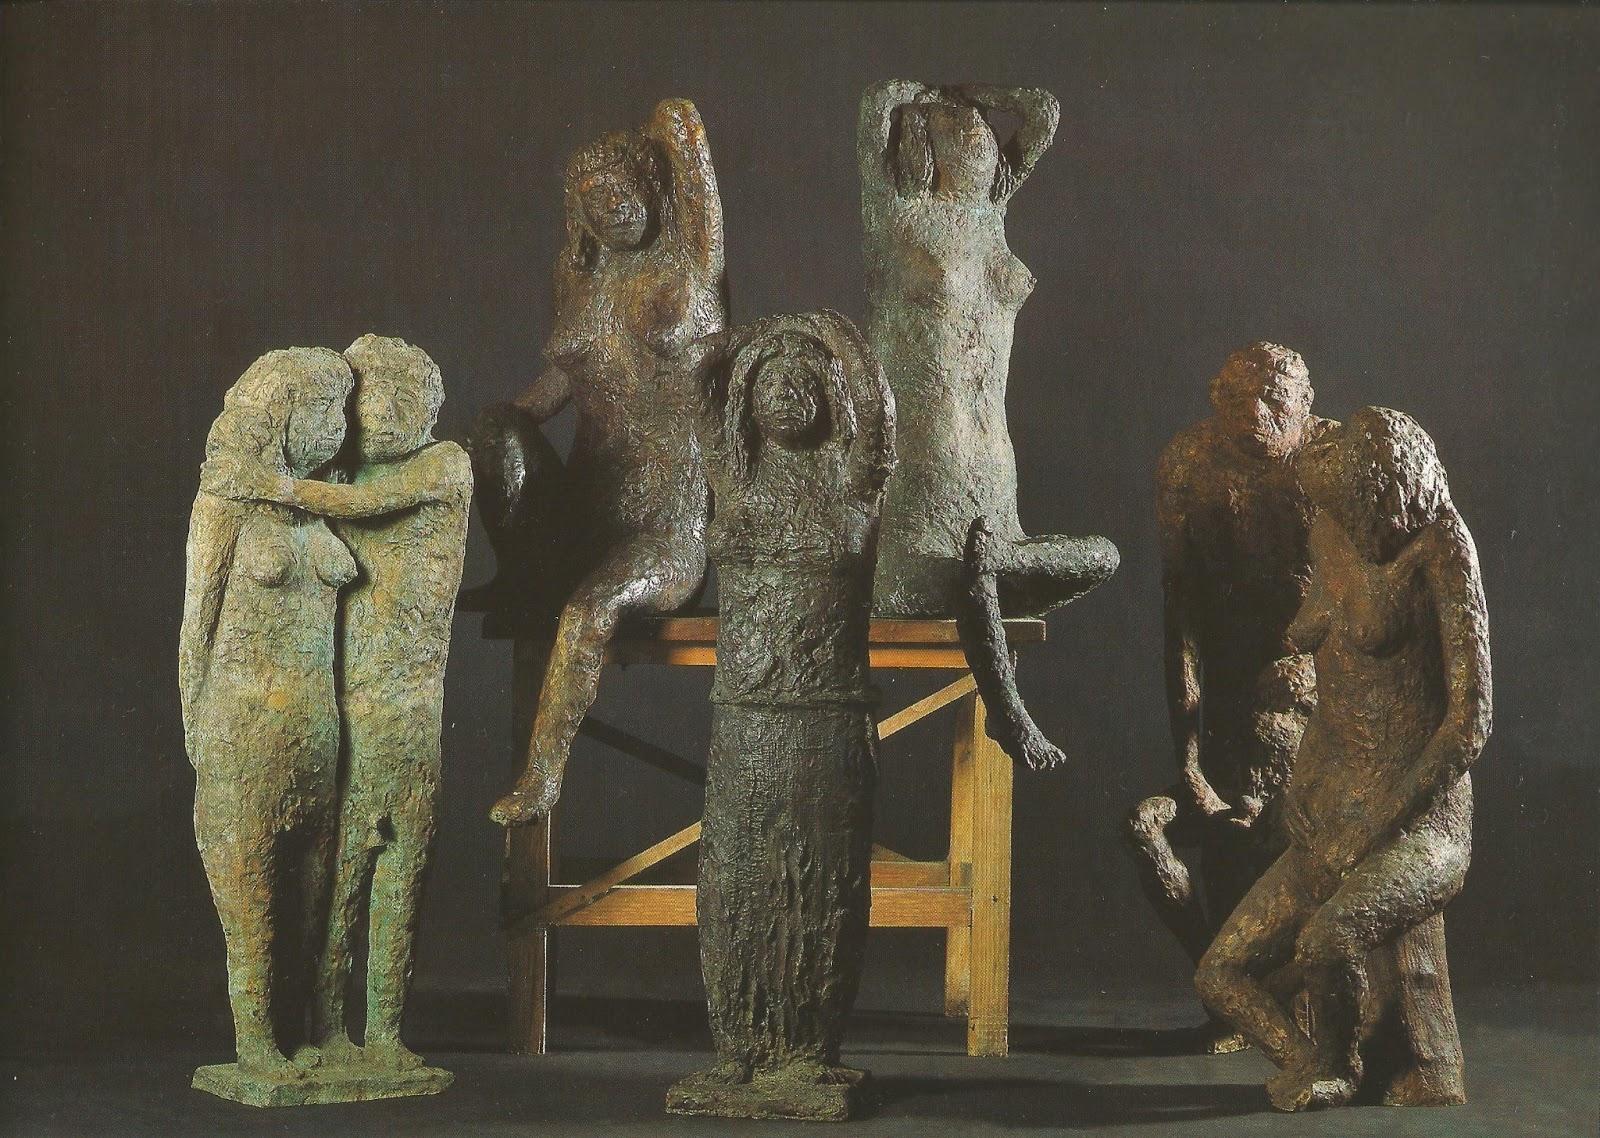 Gabirus-Xico-Stockinger-escultura-pedra-100-anos